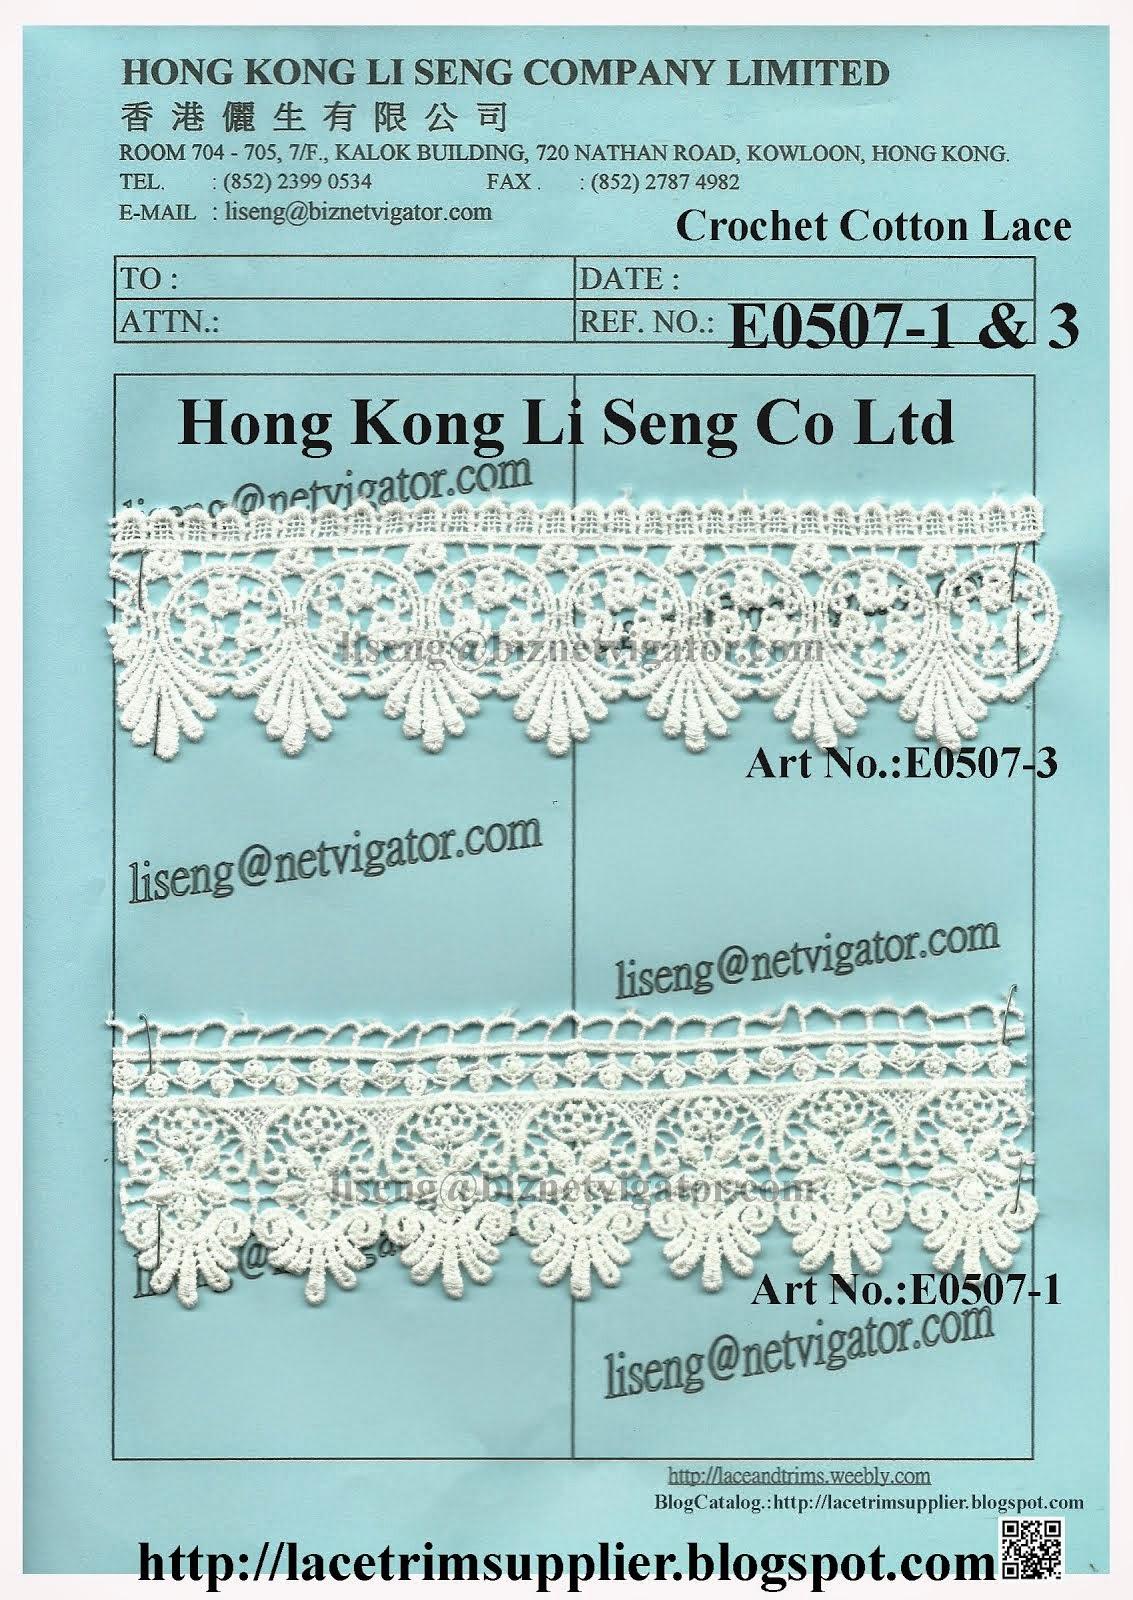 New Crochet Cotton Lace Factory - Hong Kong Li Seng Co Ltd